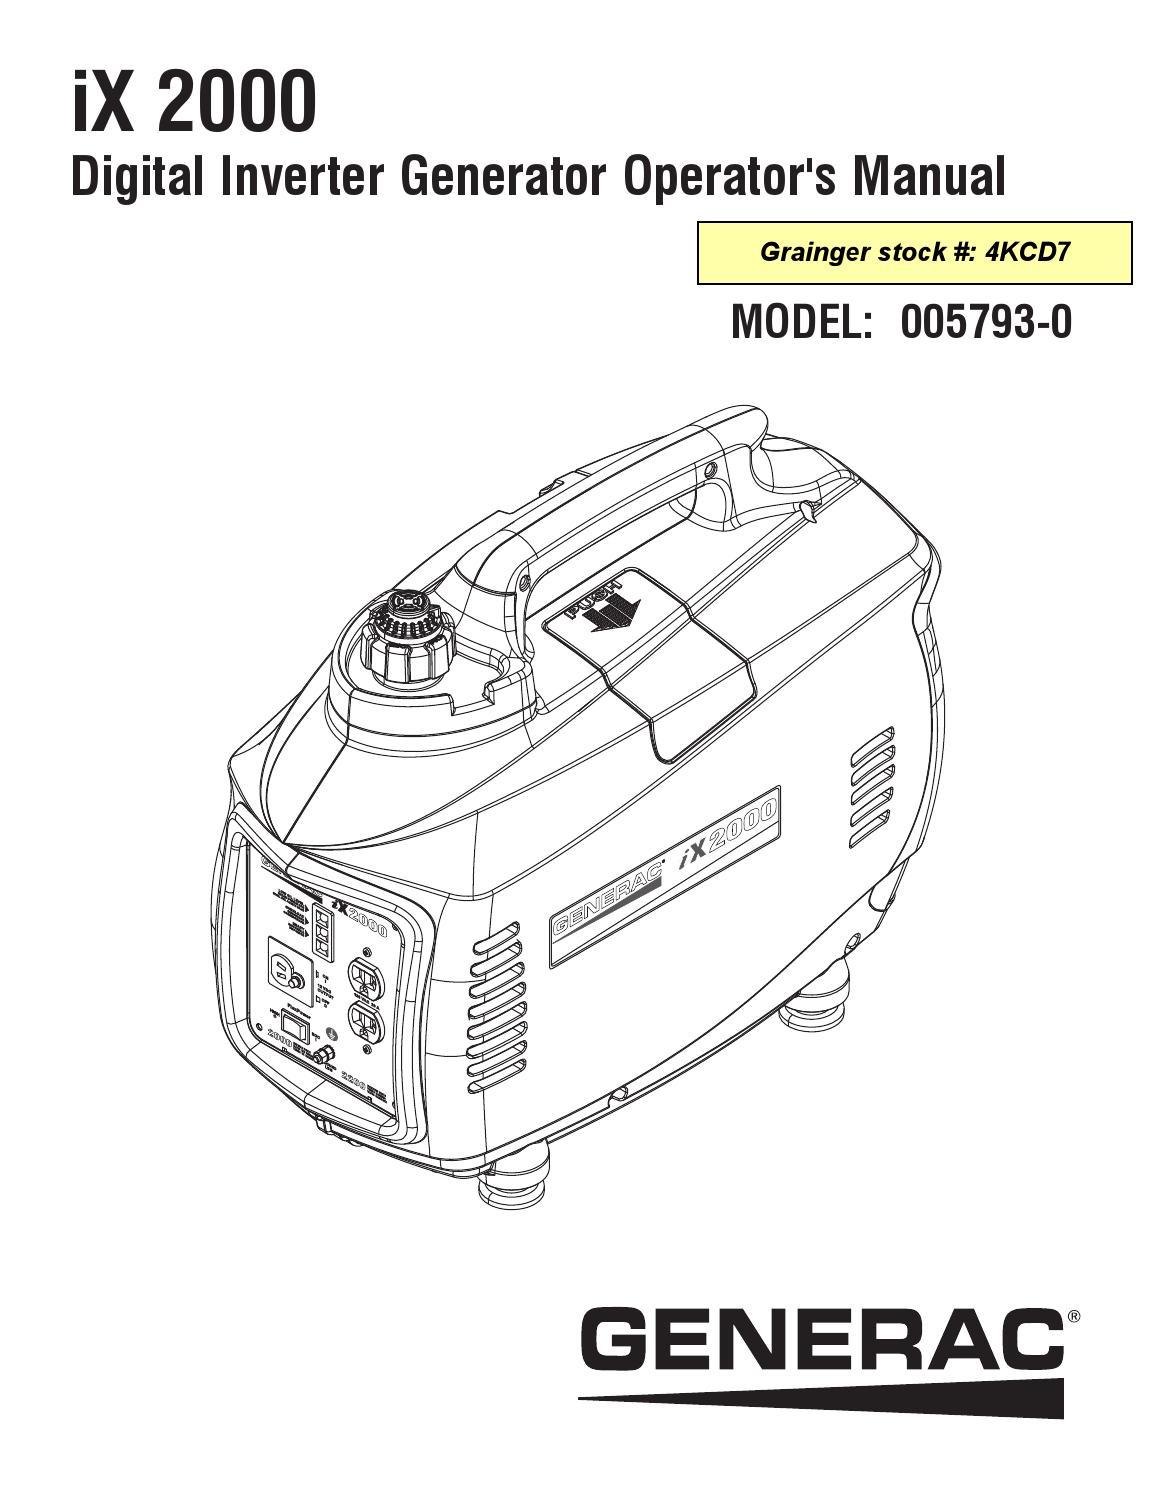 Generac Ix2000 Manual By Popunder Net Issuu